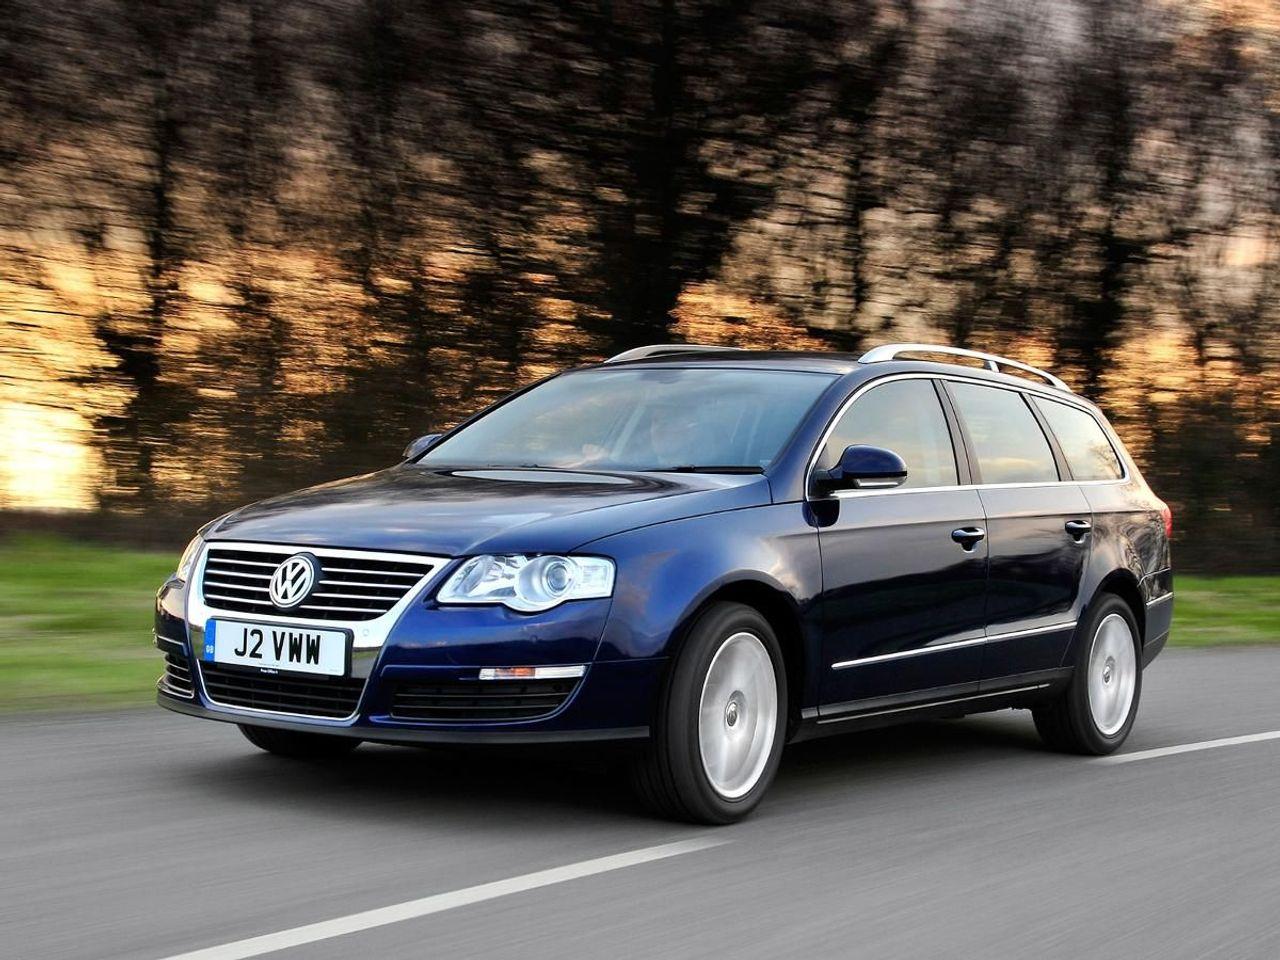 Volkswagen Passat Estate (2005 - 2011) review | Auto Trader UK